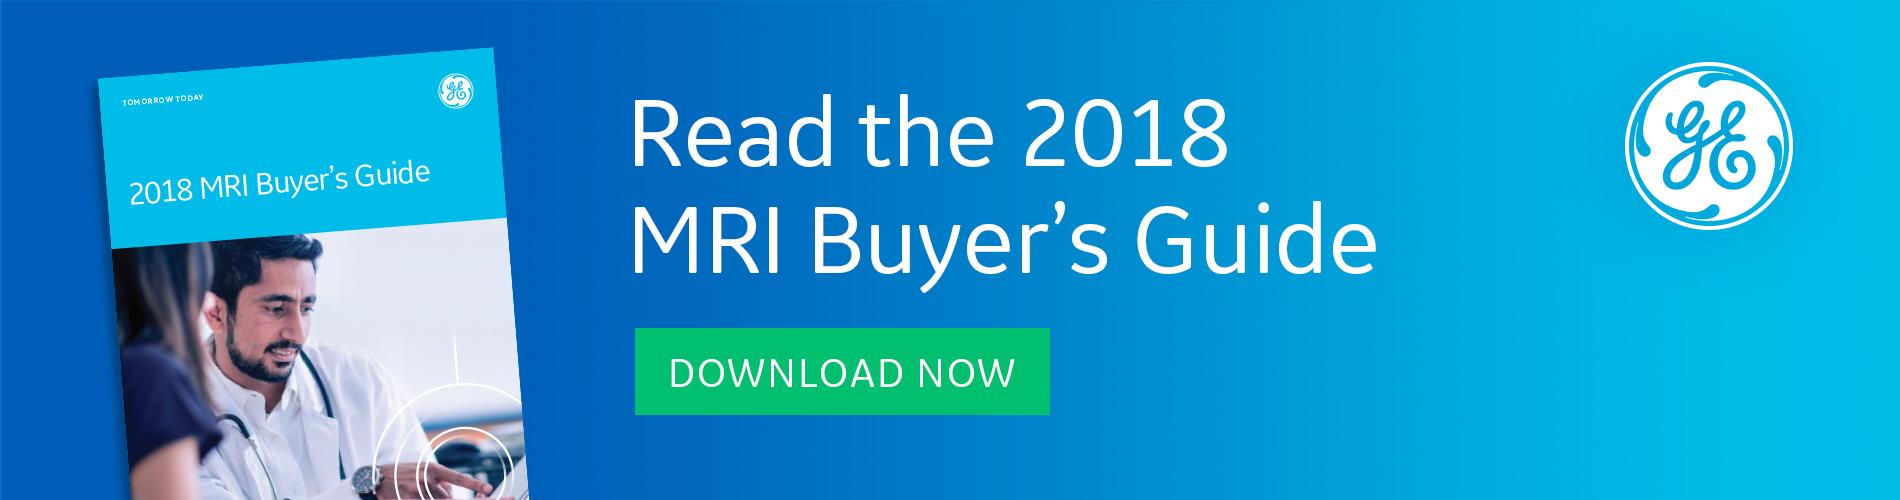 Buyers Guide_950x250.jpg